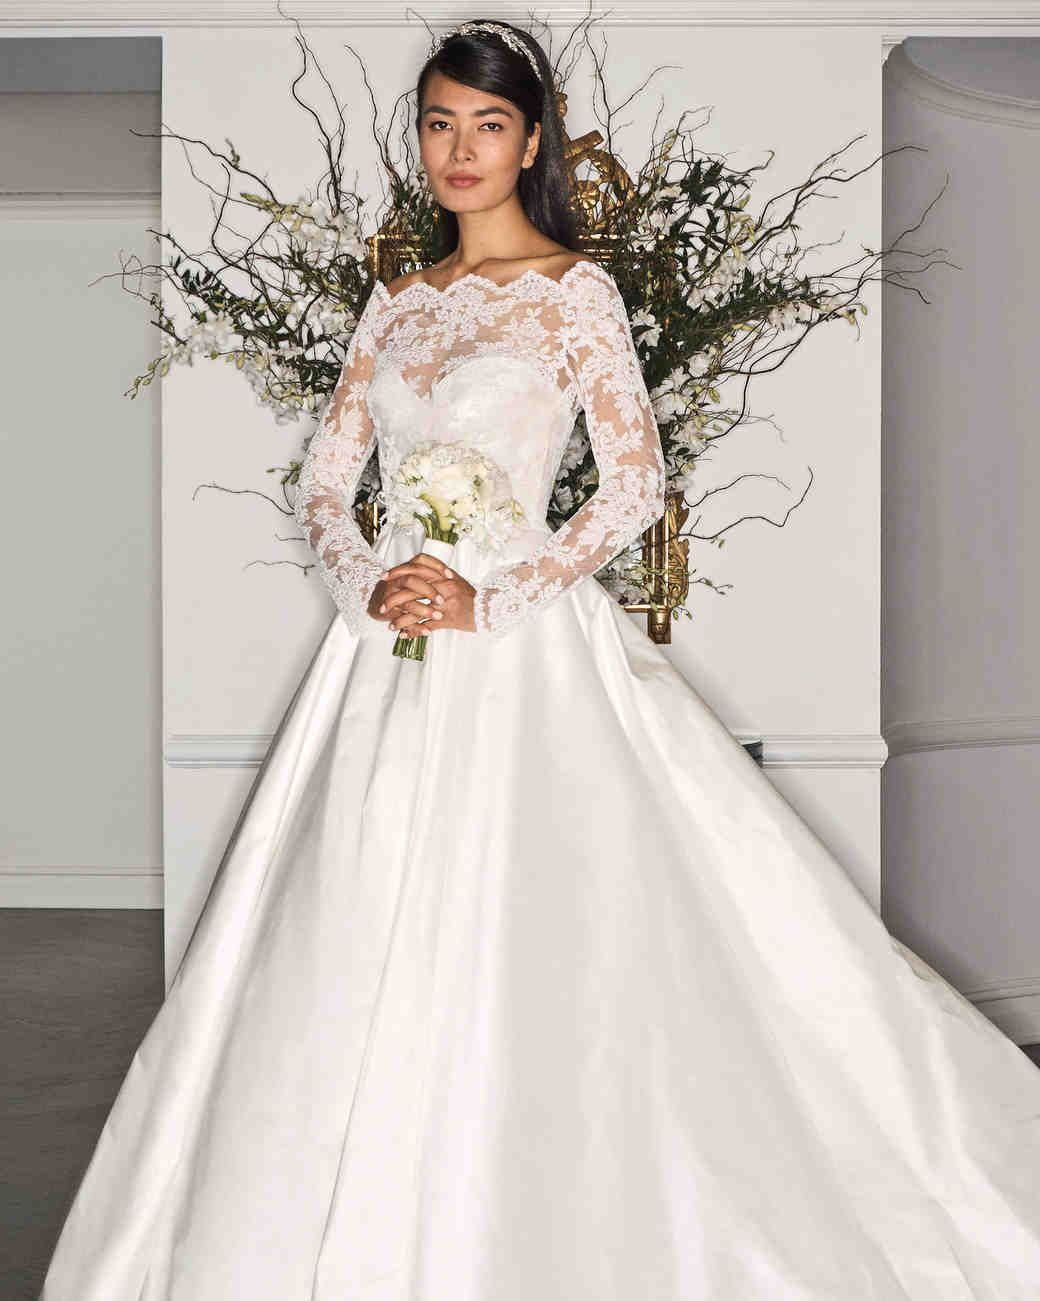 Legends Romona Keveza Fall 2017 Wedding Dress Collection | Pinterest ...